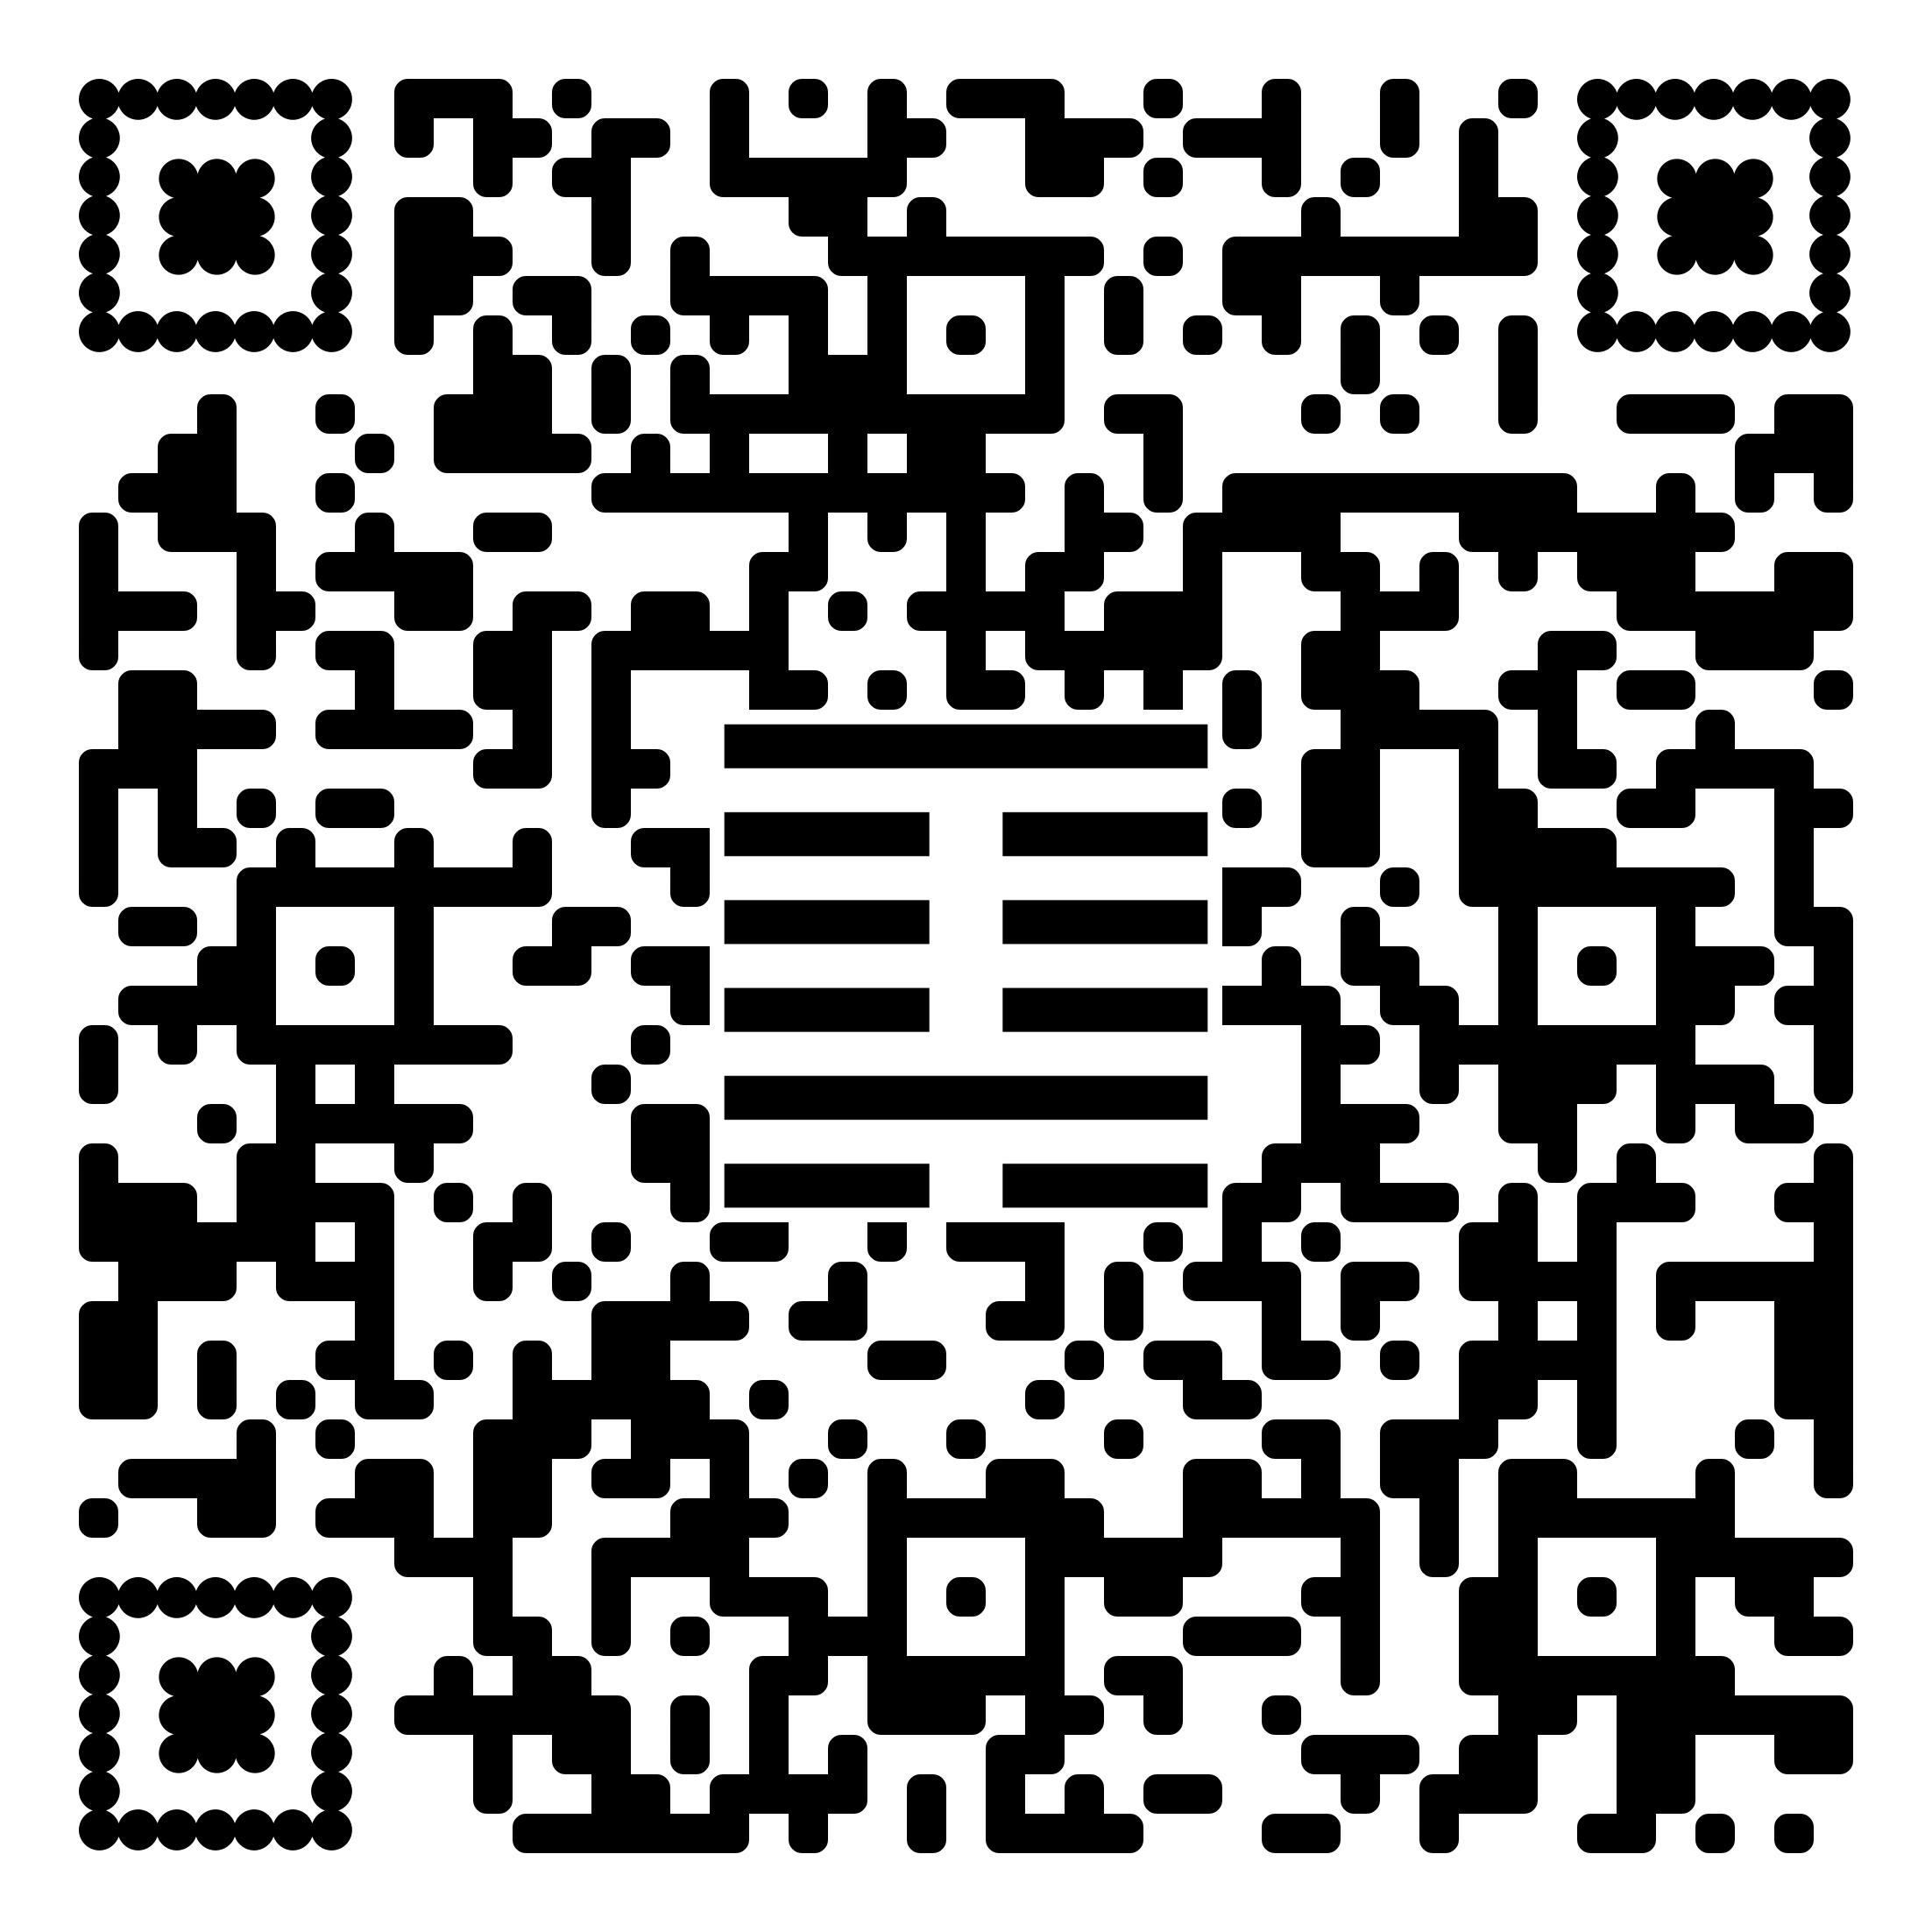 qr-code-4.png